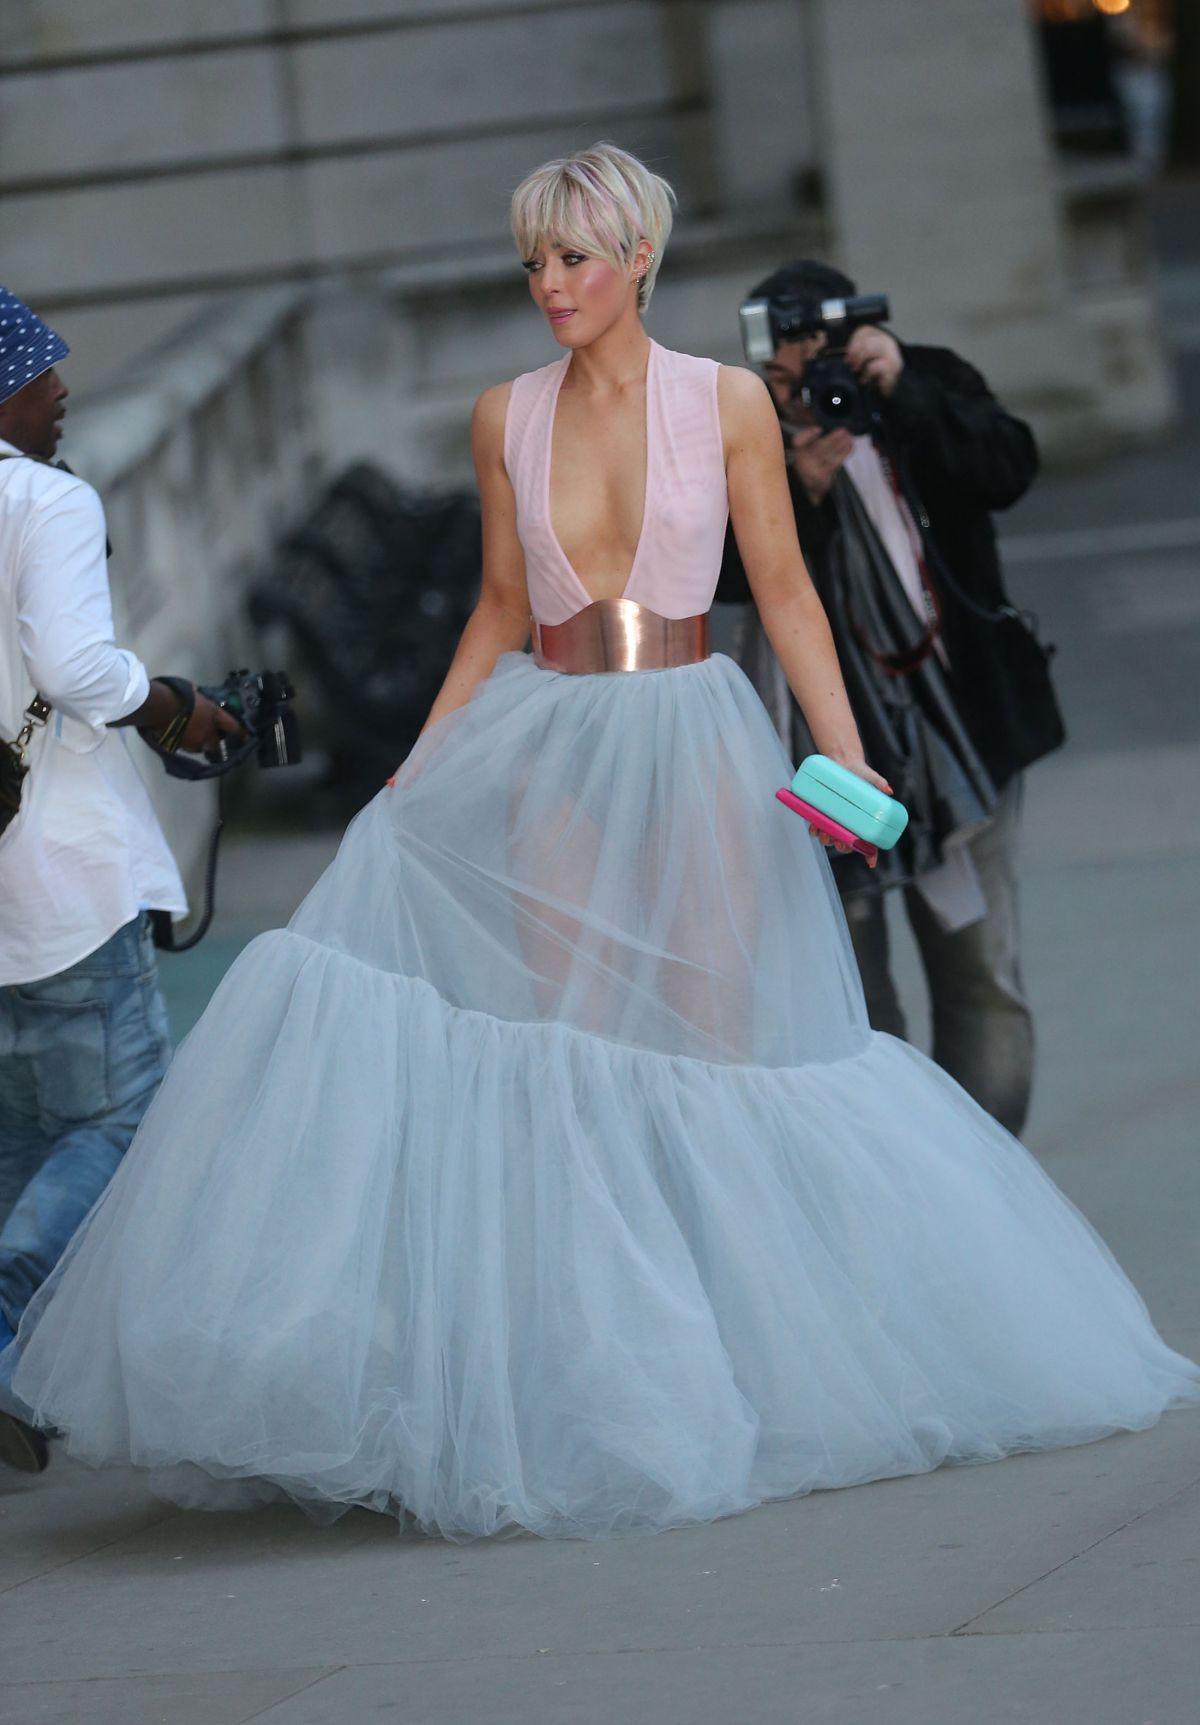 hatty-keane-at-revlon-choose-love-masquerade-ball-in-london-07-21 ...